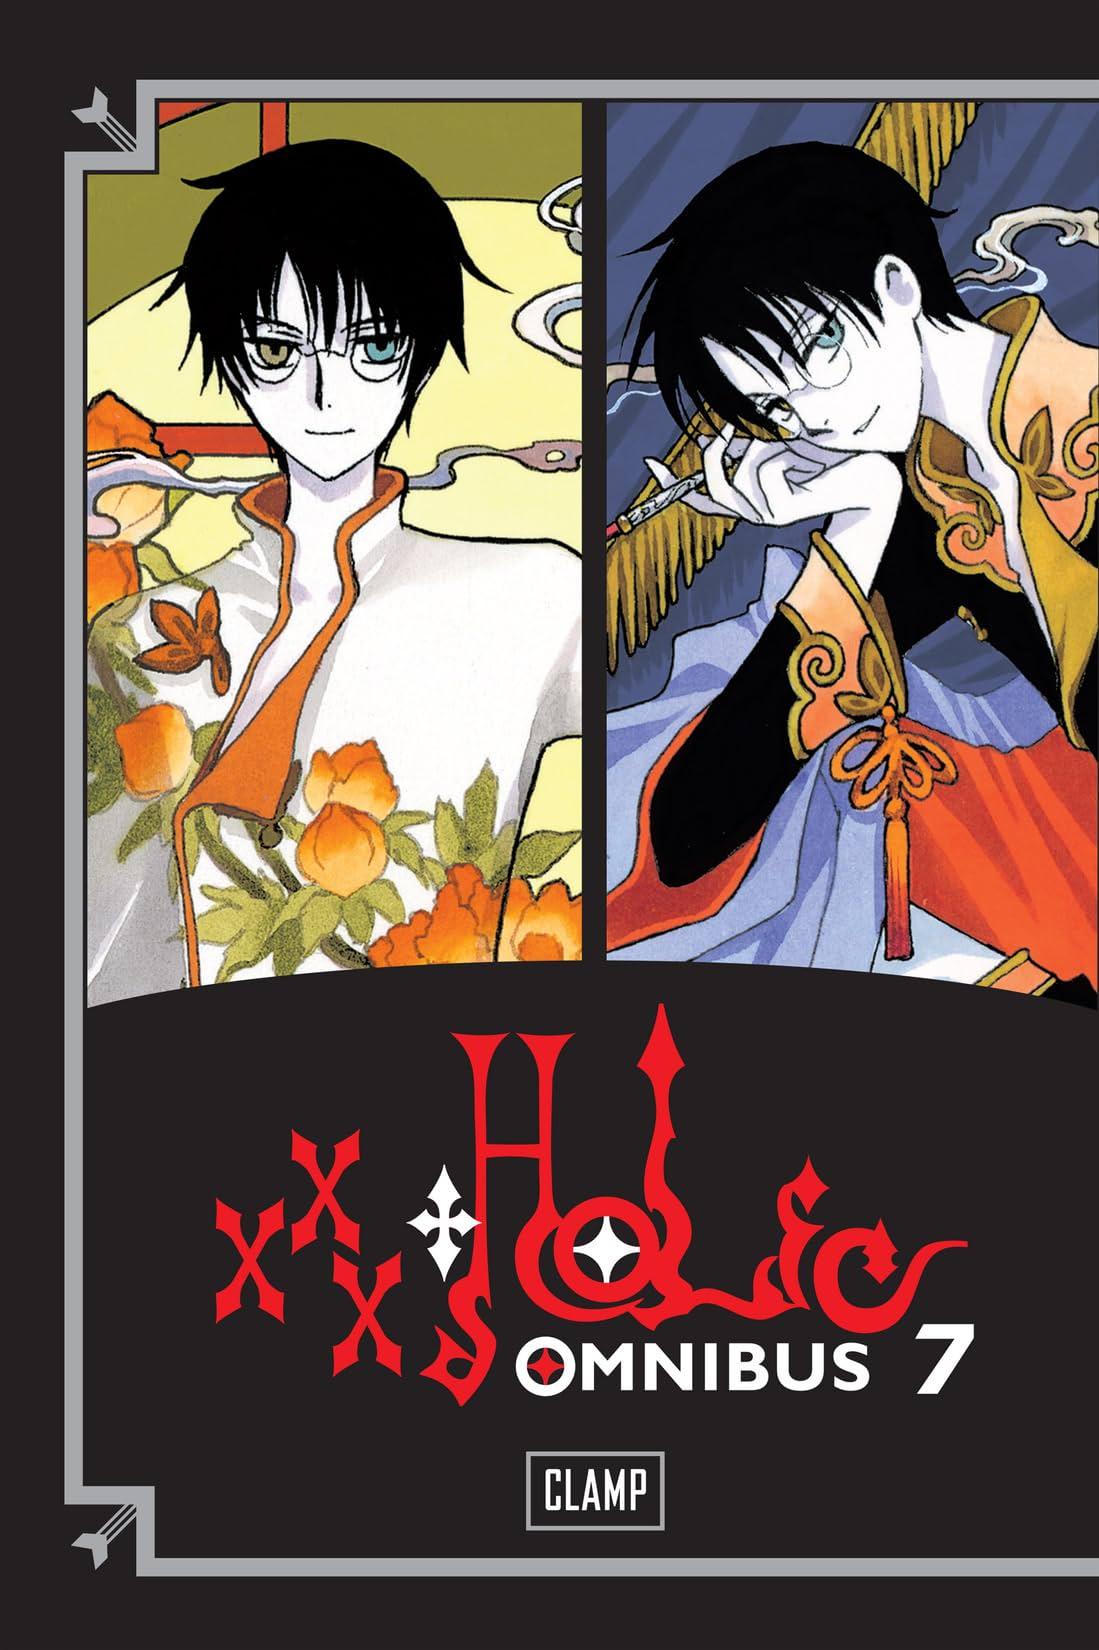 xxxHOLiC Omnibus Vol. 7